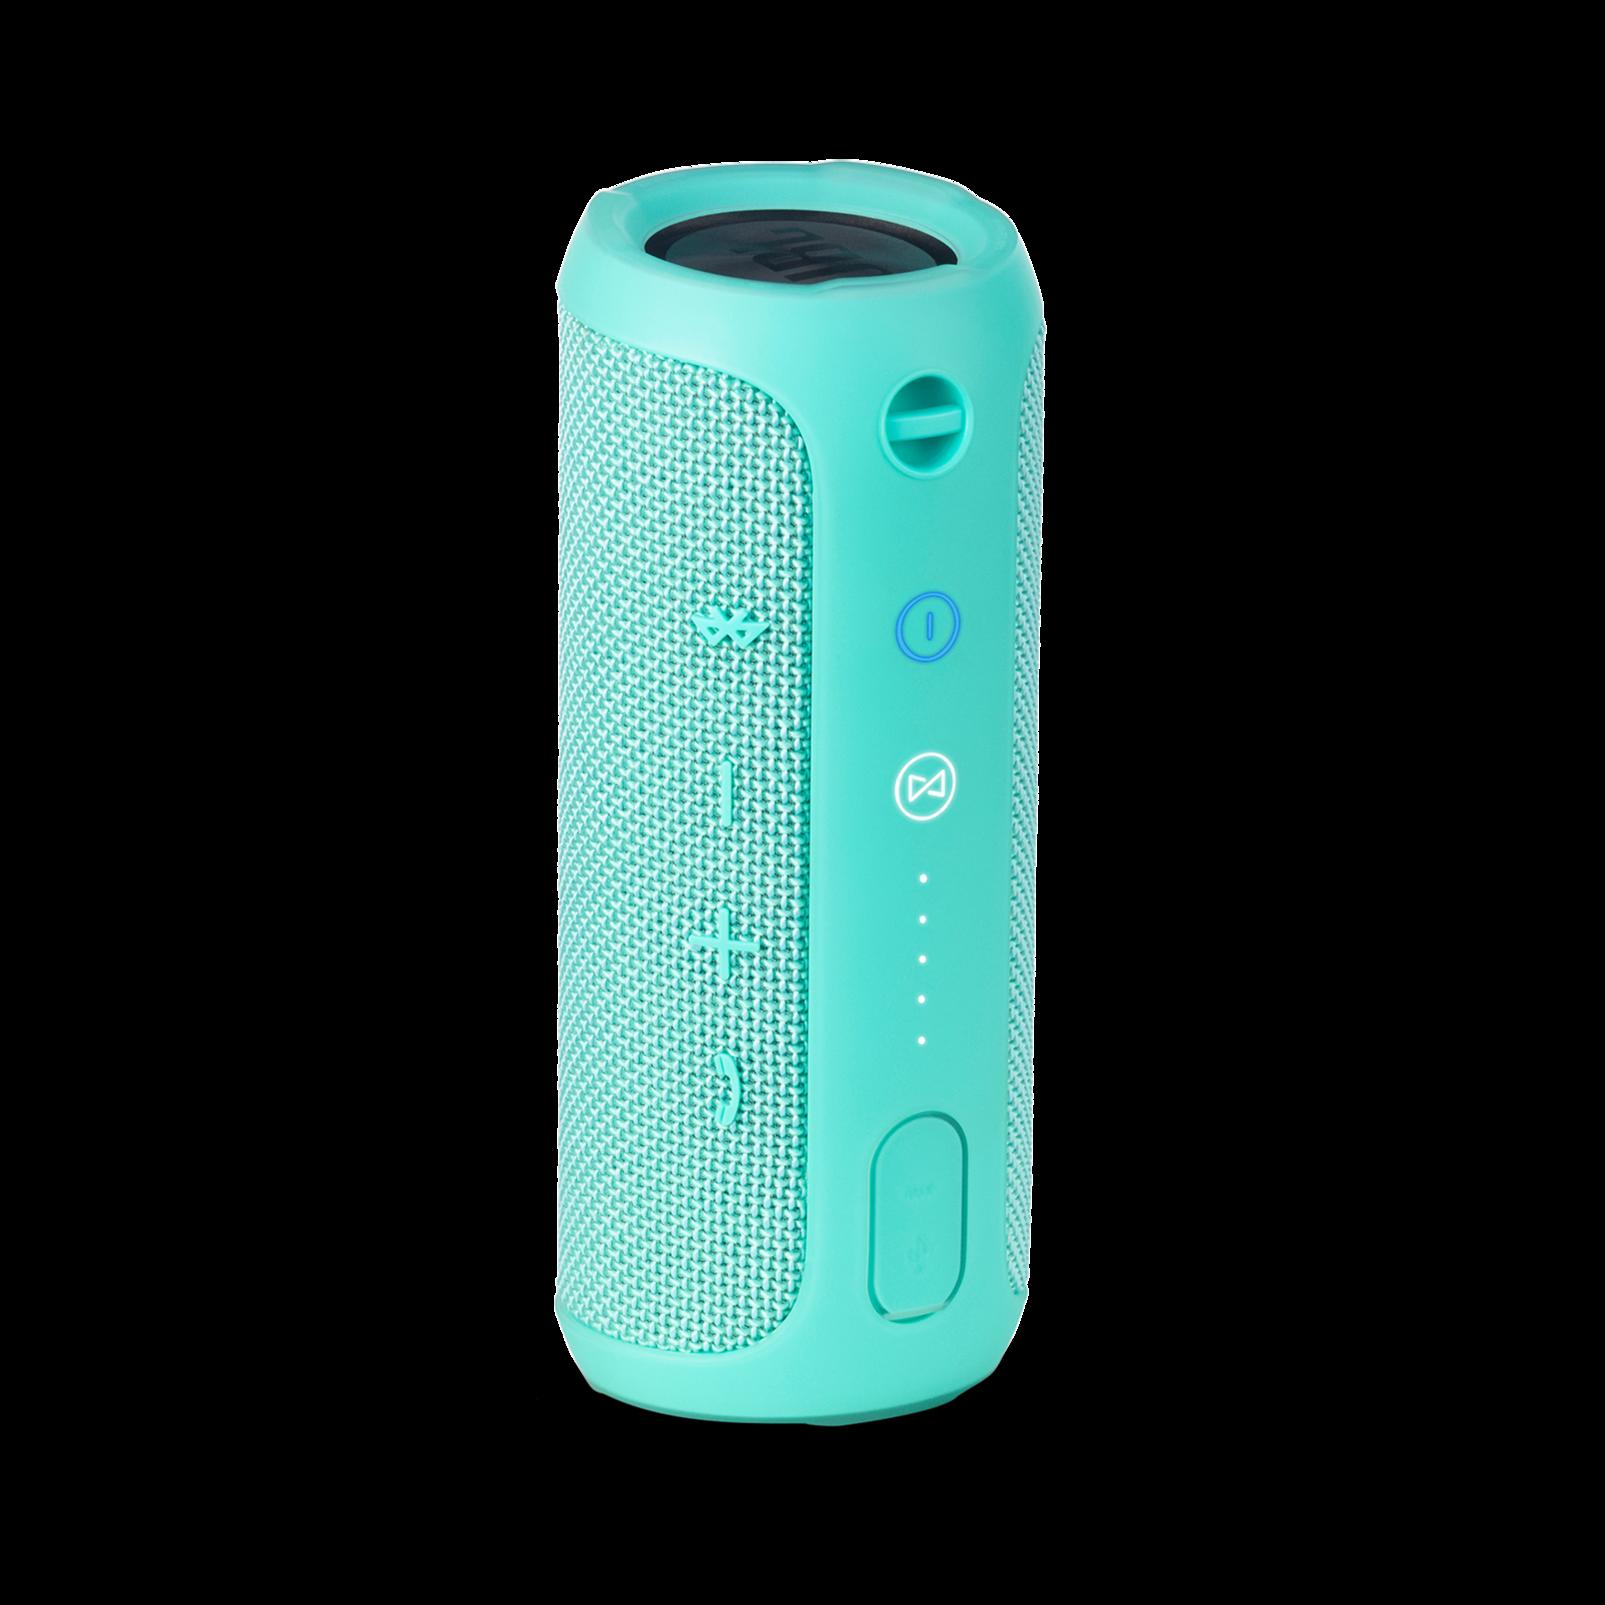 JBL Flip 3 - Teal - Splashproof portable Bluetooth speaker with powerful sound and speakerphone technology - Back